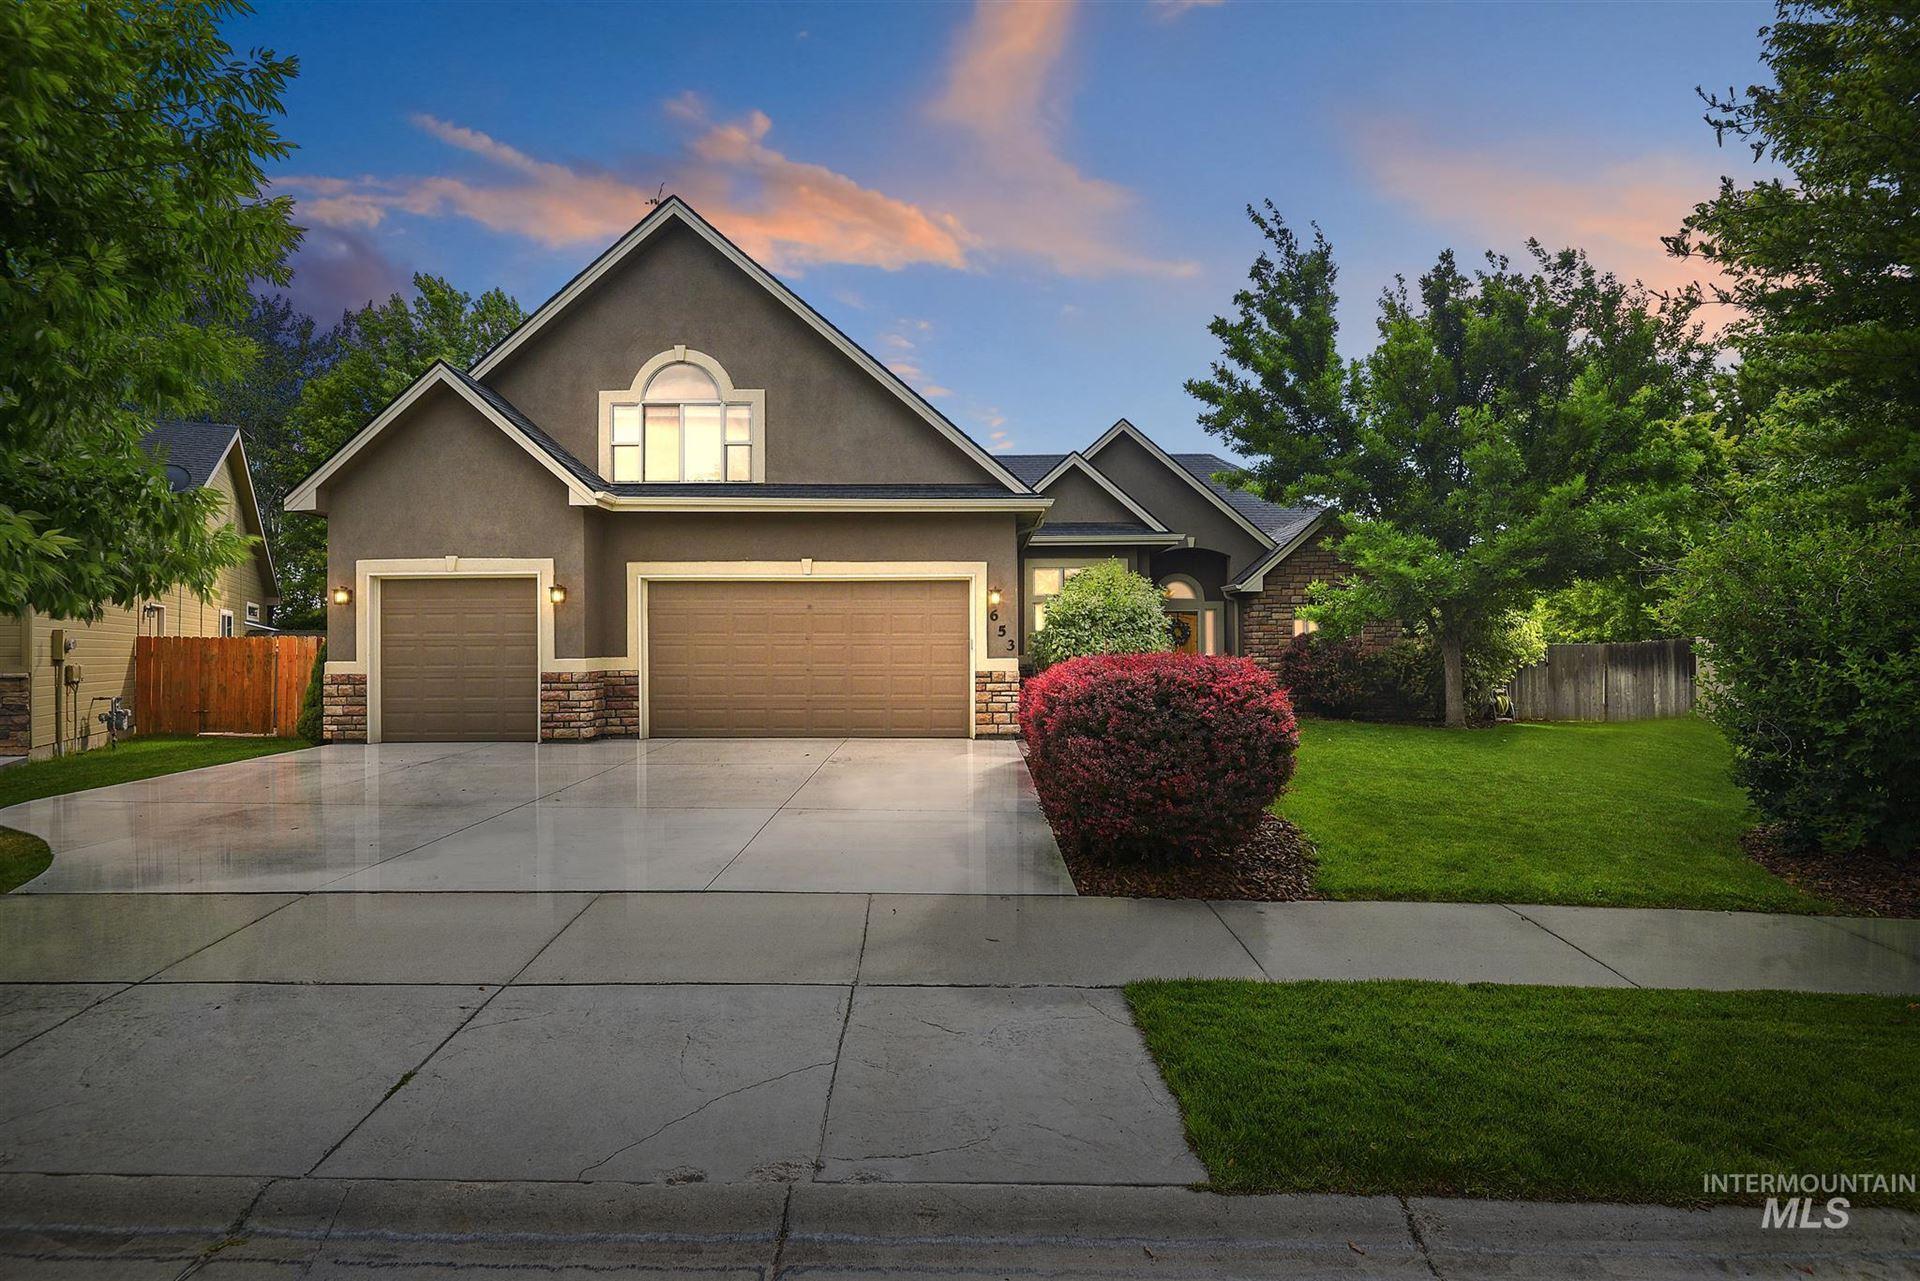 653 N Shadowridge Ave, Eagle, ID 83616 - MLS#: 98769866